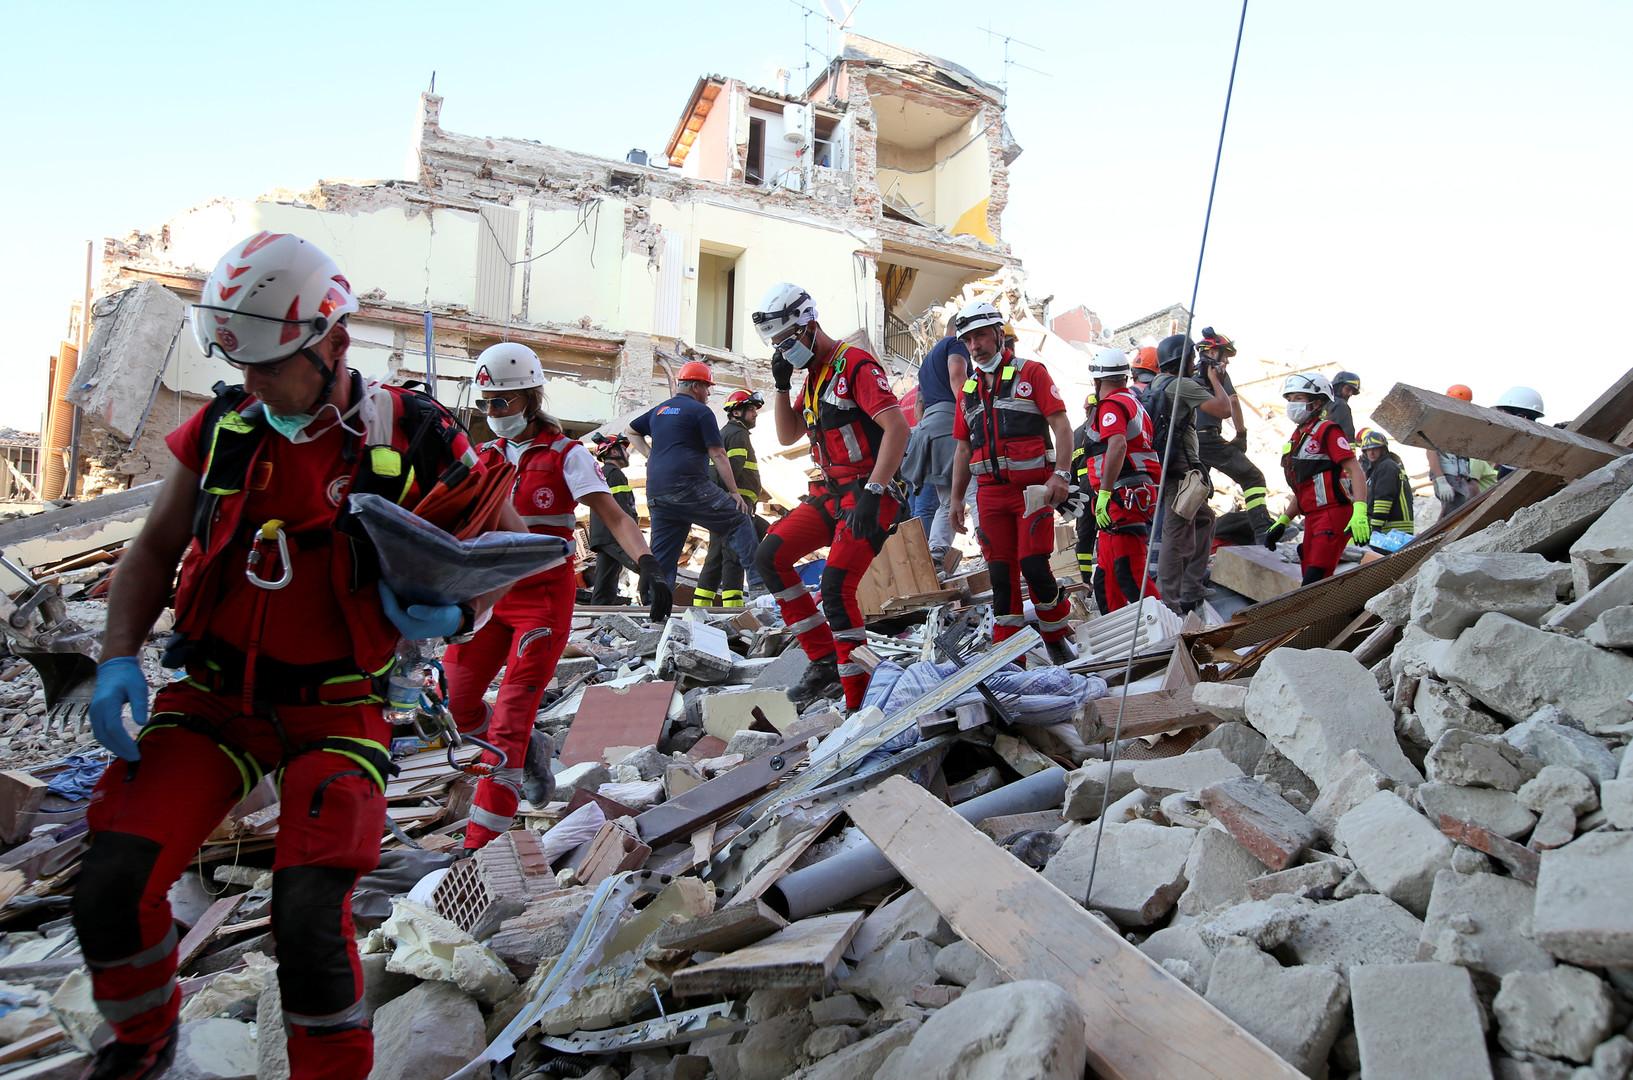 Центр разрушения: в Италии растёт число жертв землетрясения